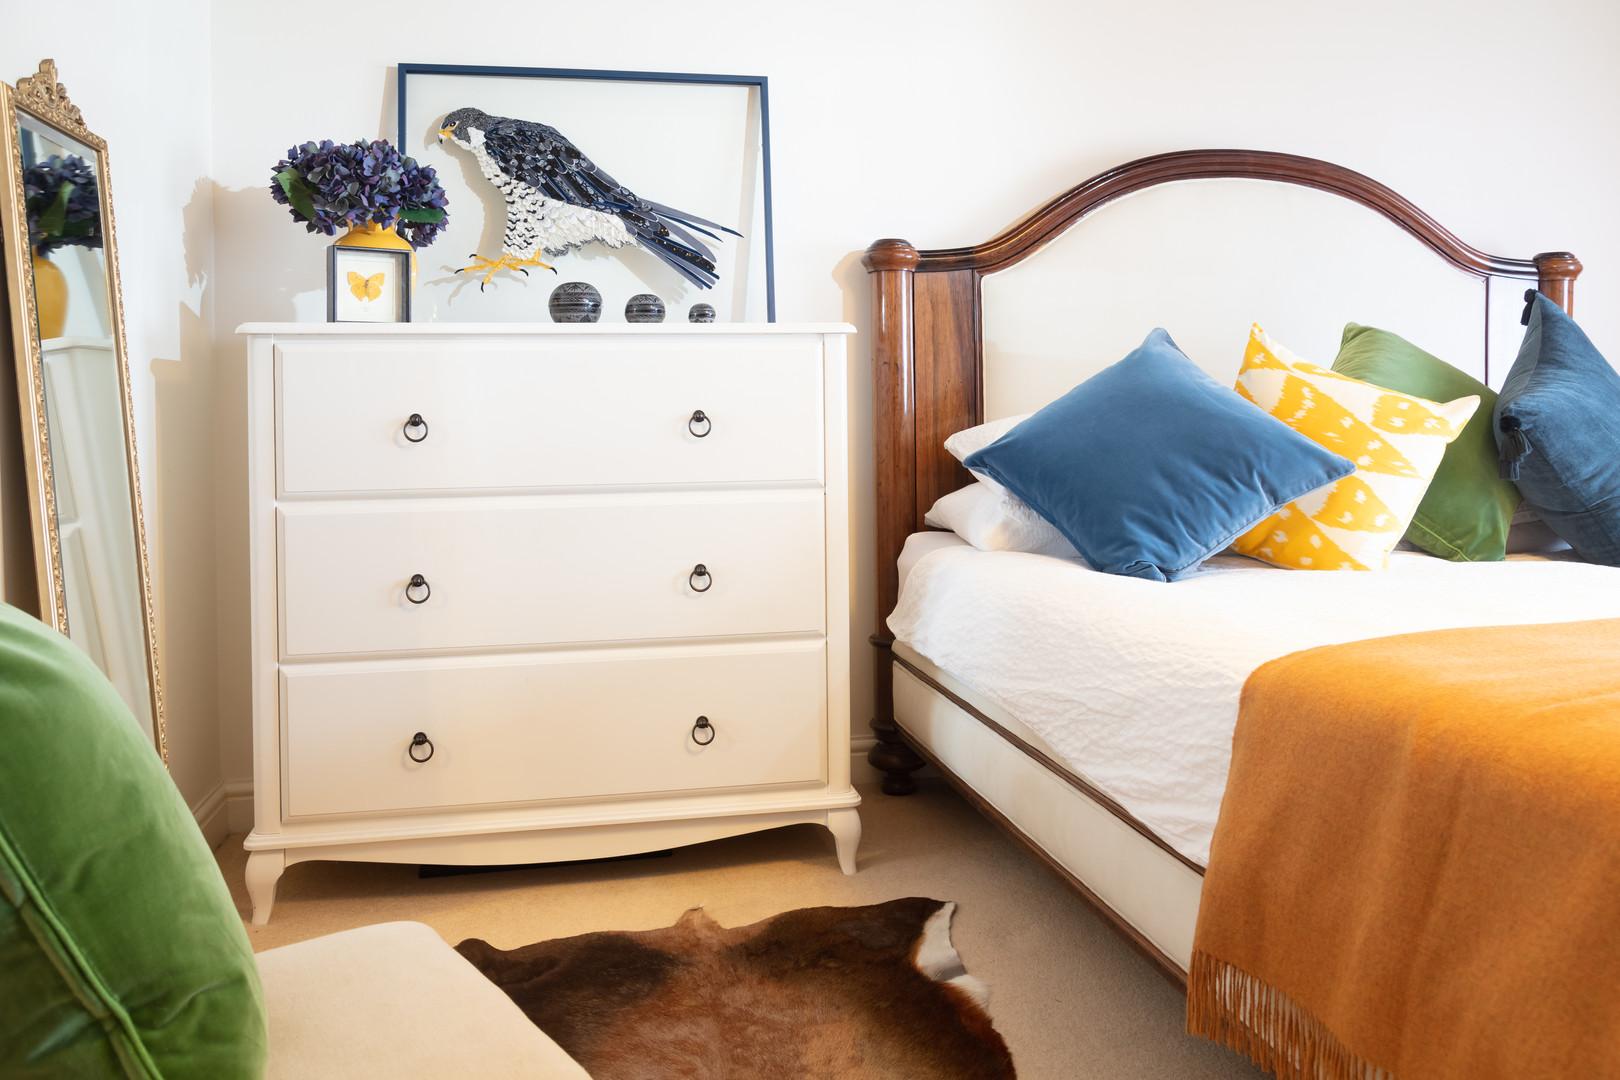 Peregrine Falcon Bedroom Art - Lily Adele Art